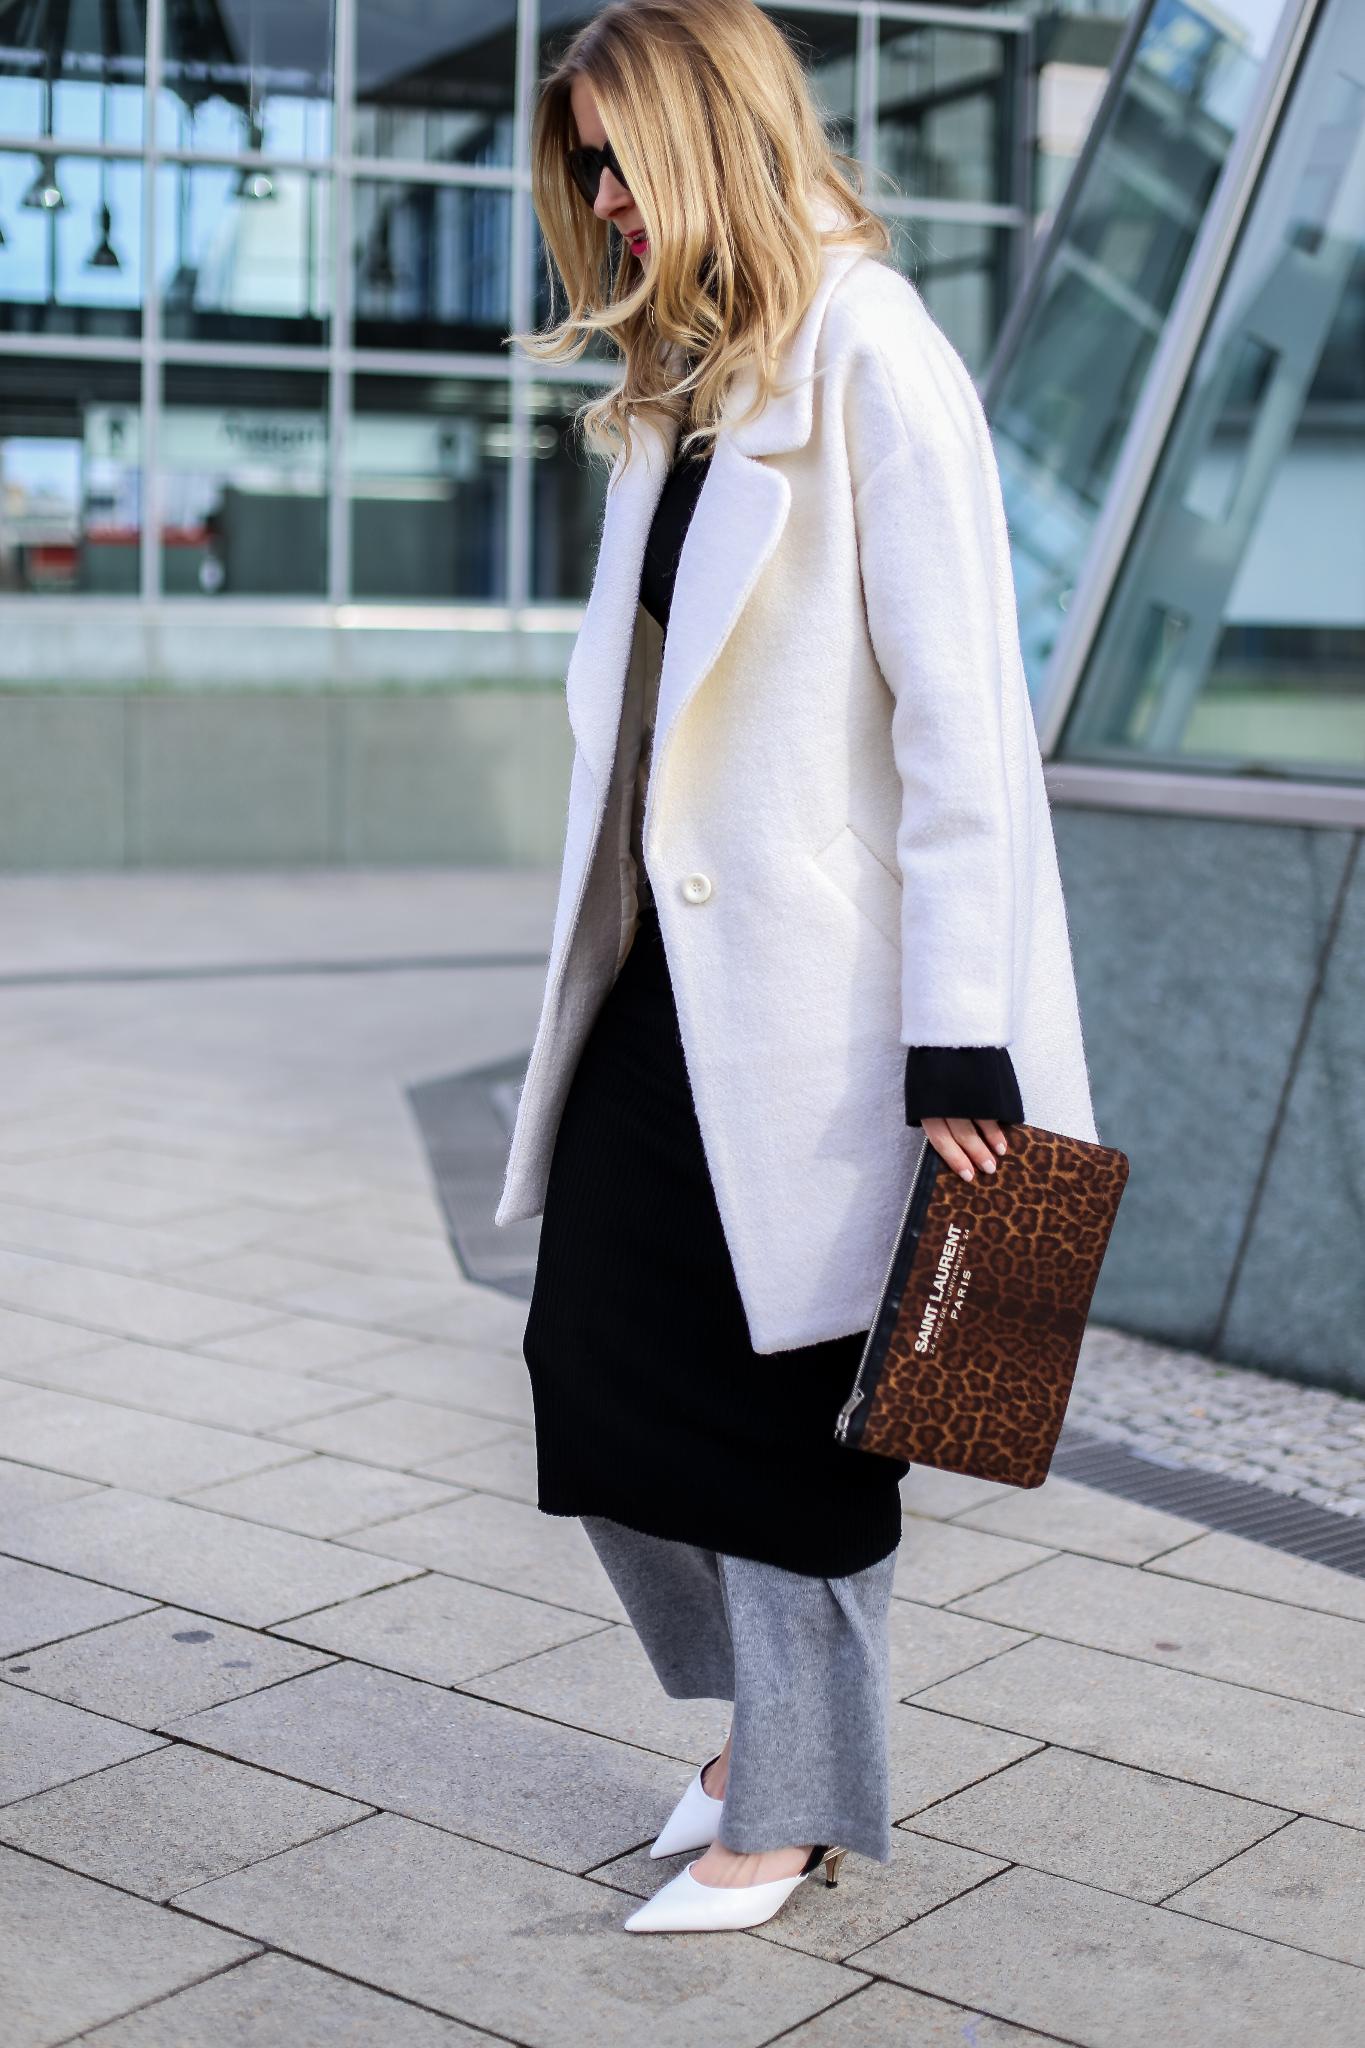 MOD-by-Monique-Fashion-Looks-Neutral-Layers-14